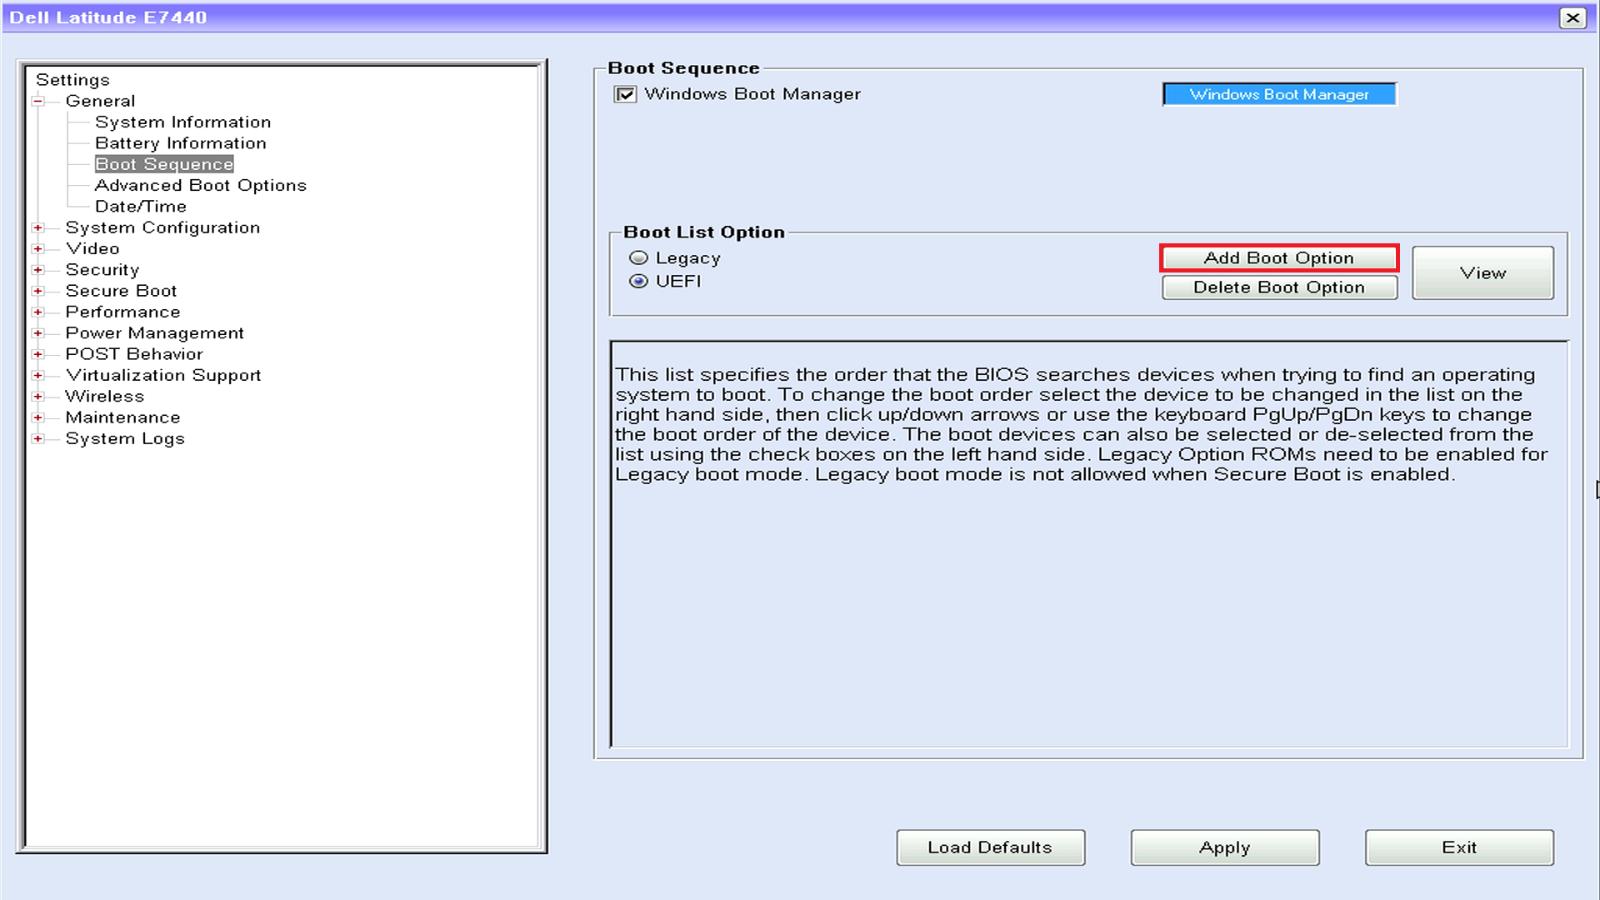 SLN142679_nl_NL__5UEFI_BIOS_Add_Boot_Option